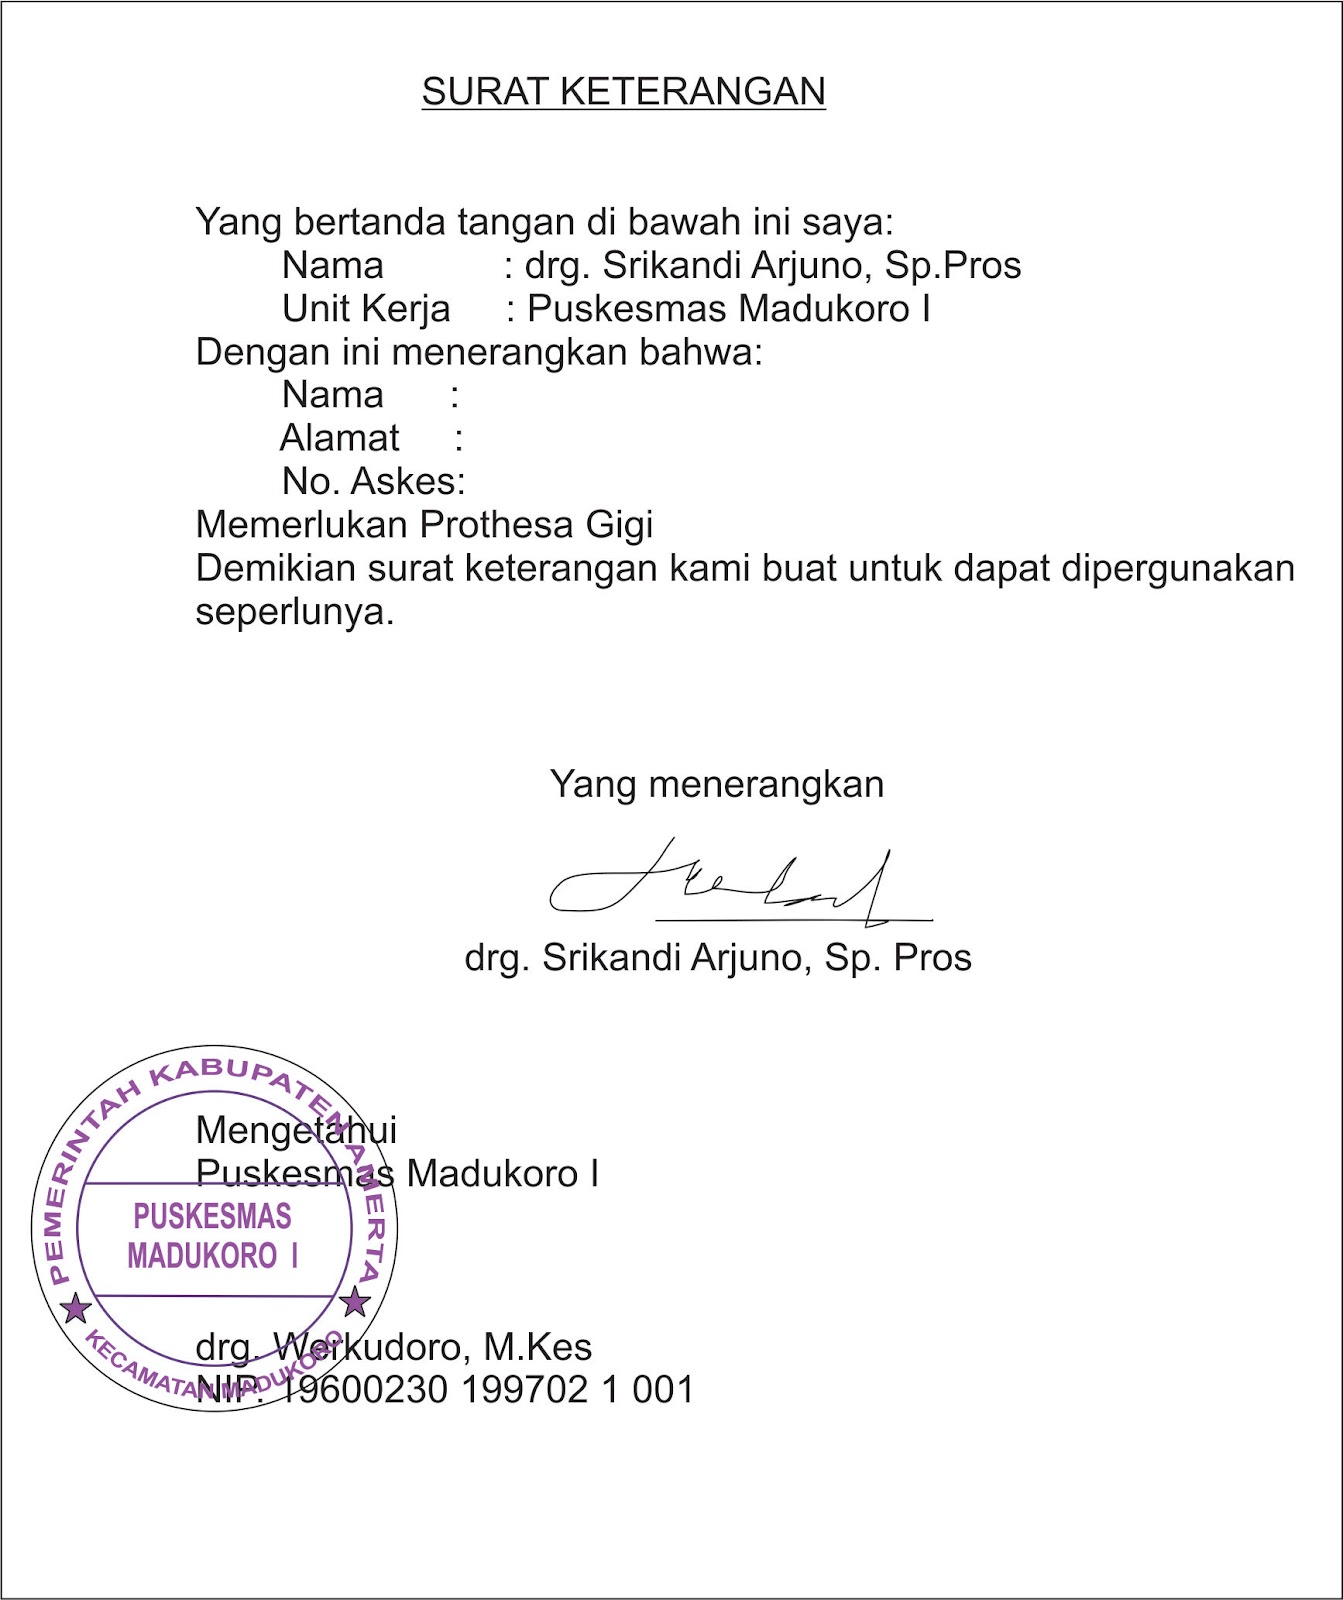 Pdgi Cabang Wonogiri Februari 2012